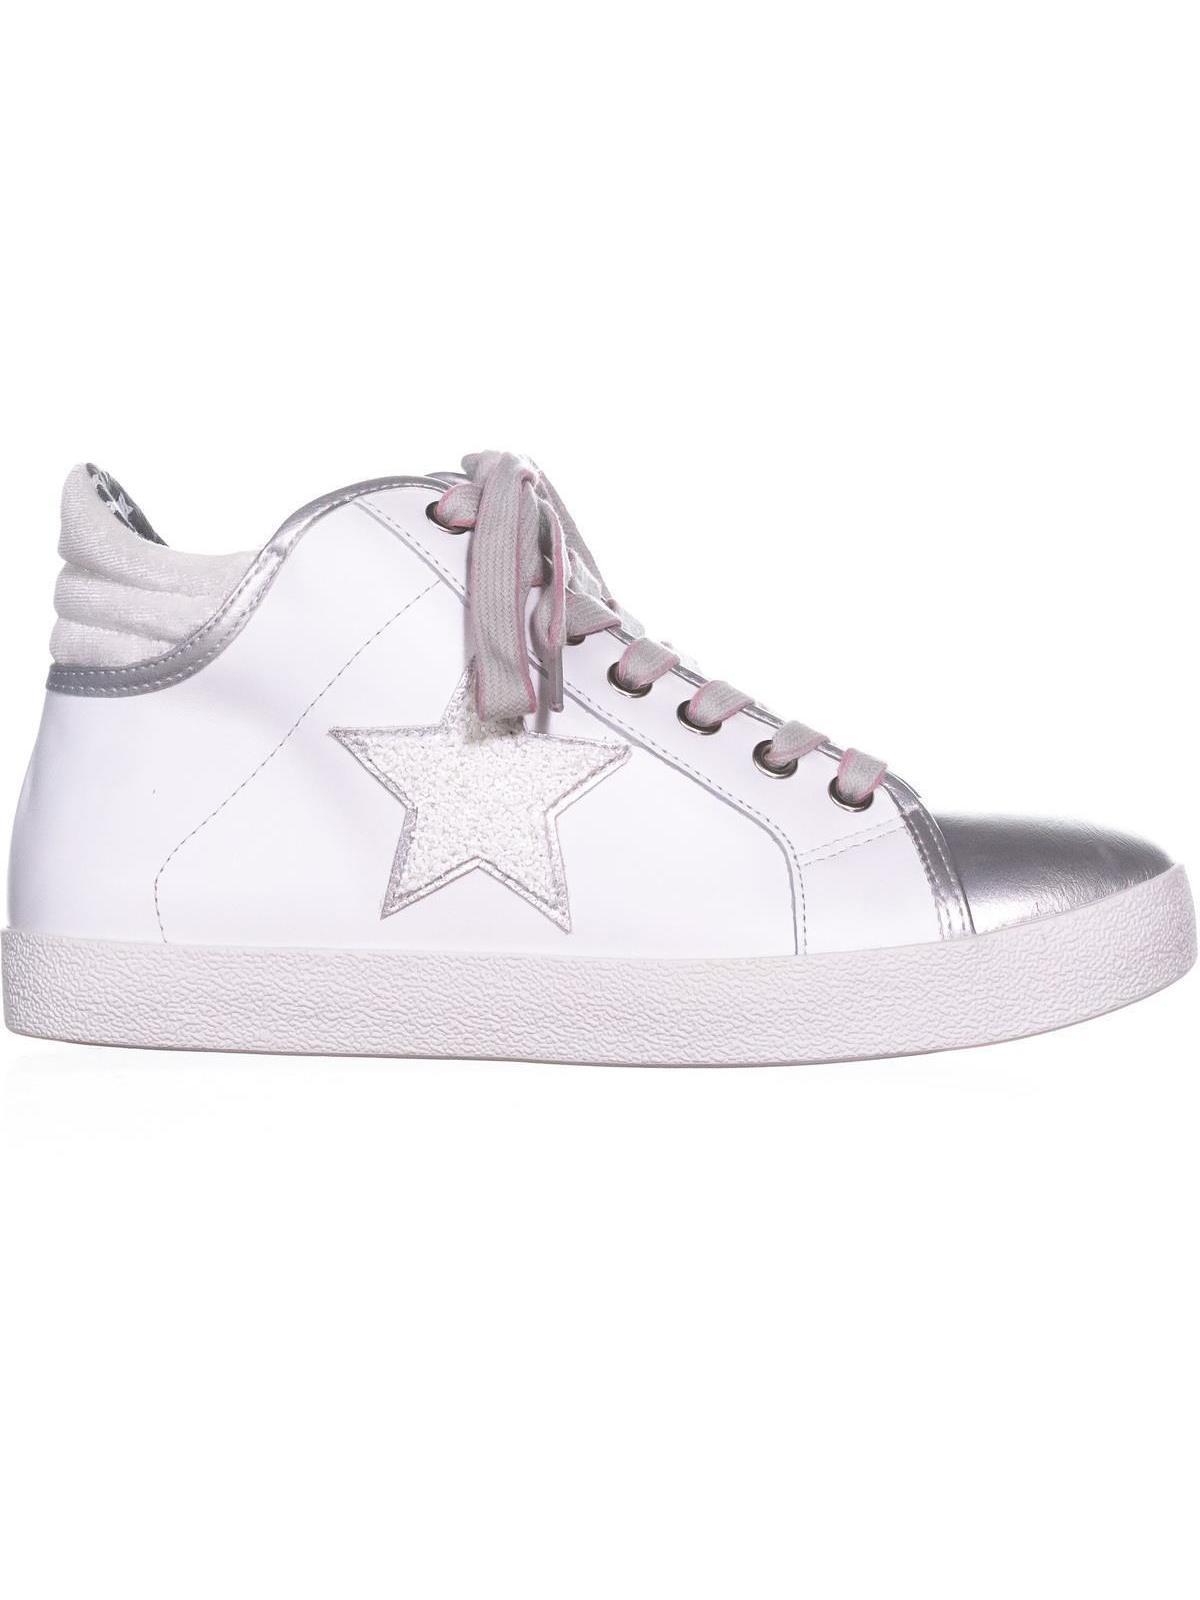 Steve Madden Savior Star Sneakers